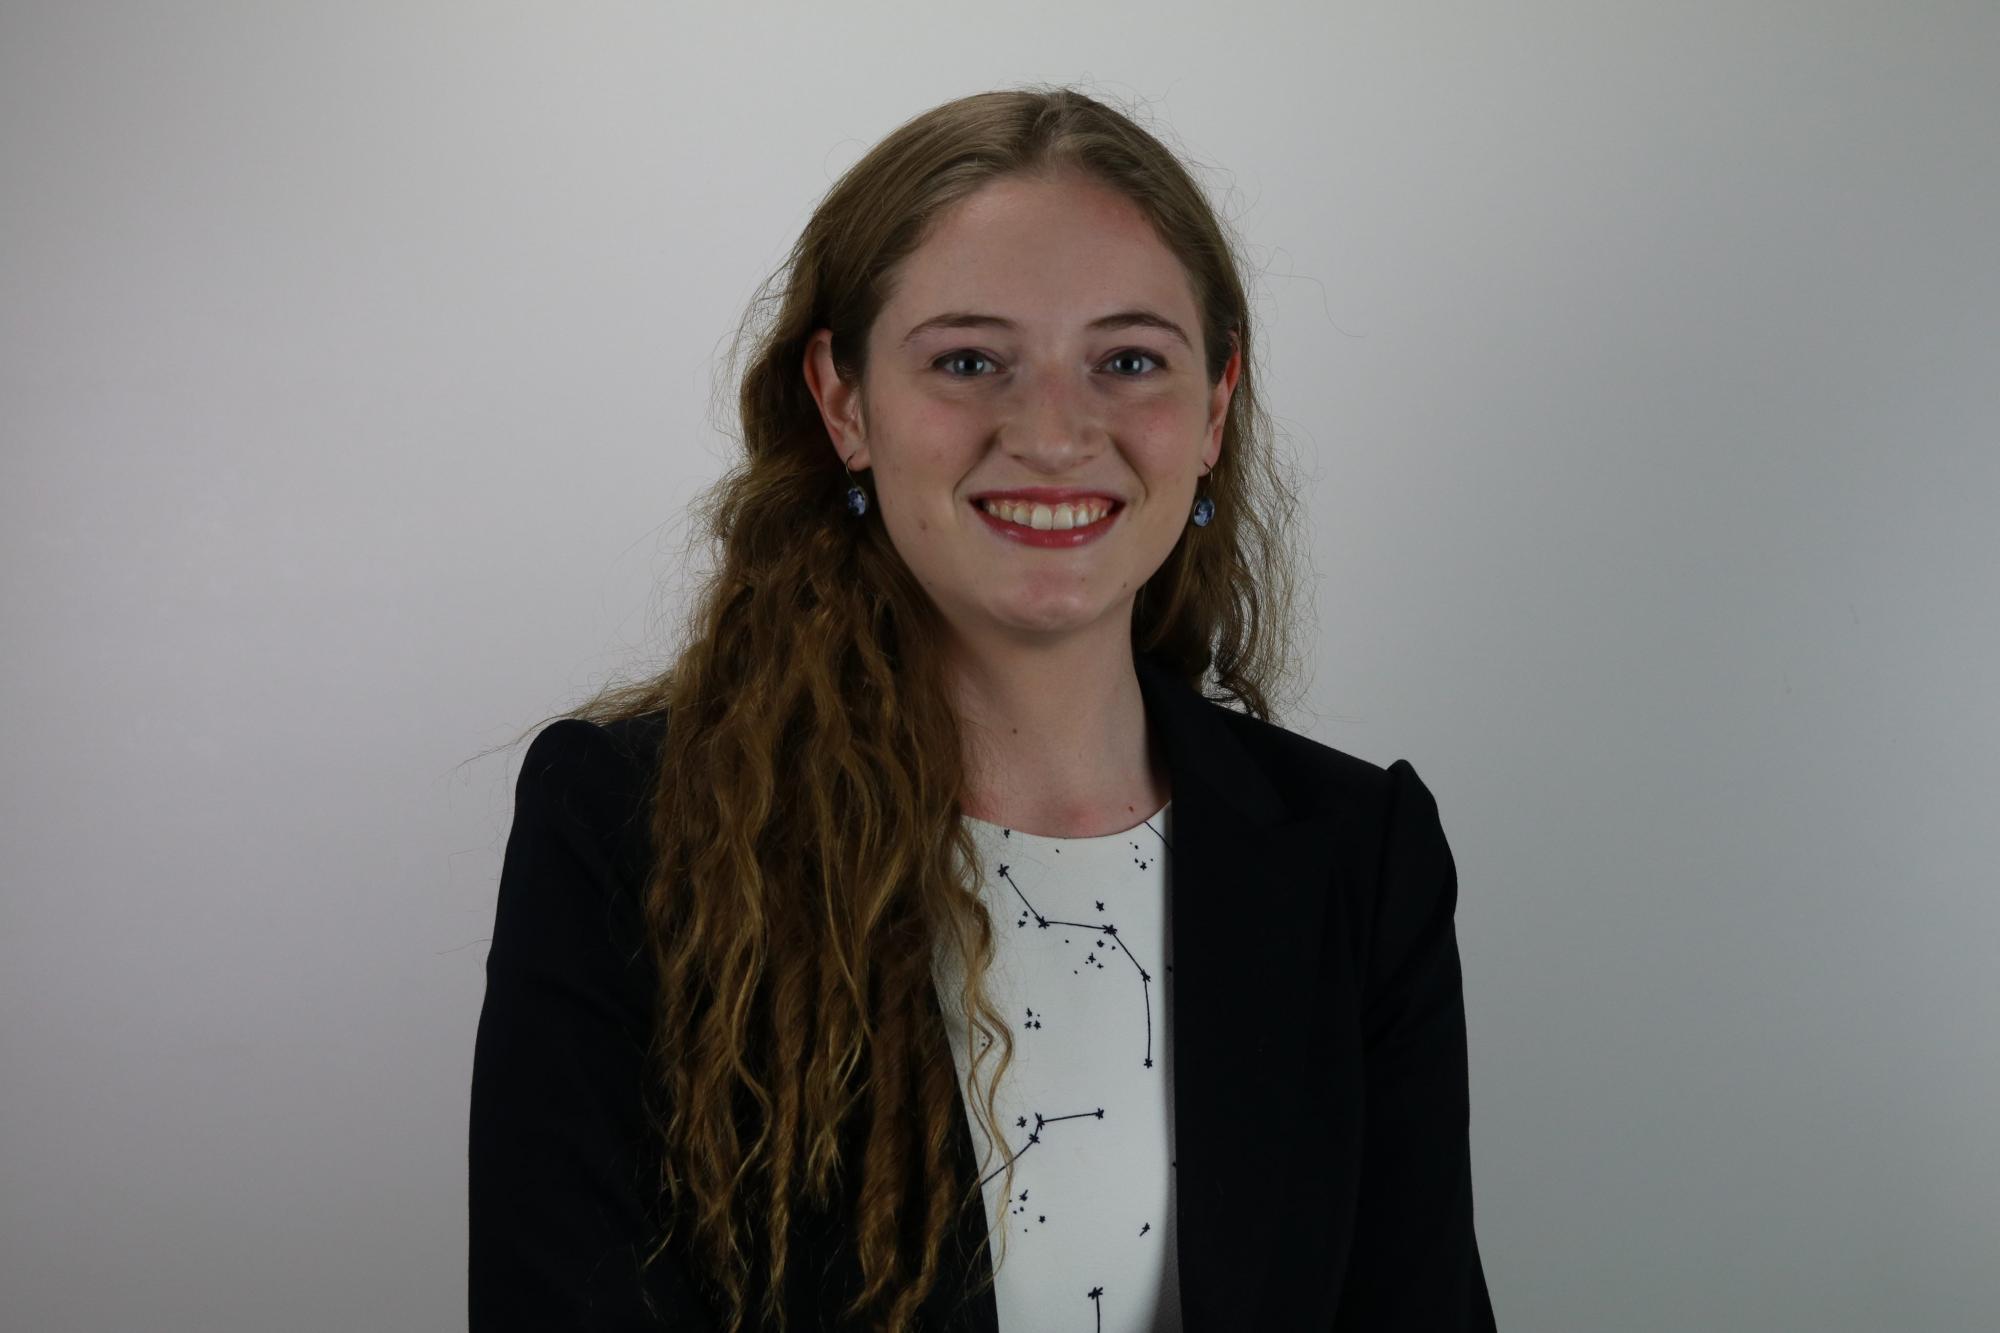 Jenny Calahan will begin graduate studies at the University of Michigan this fall.